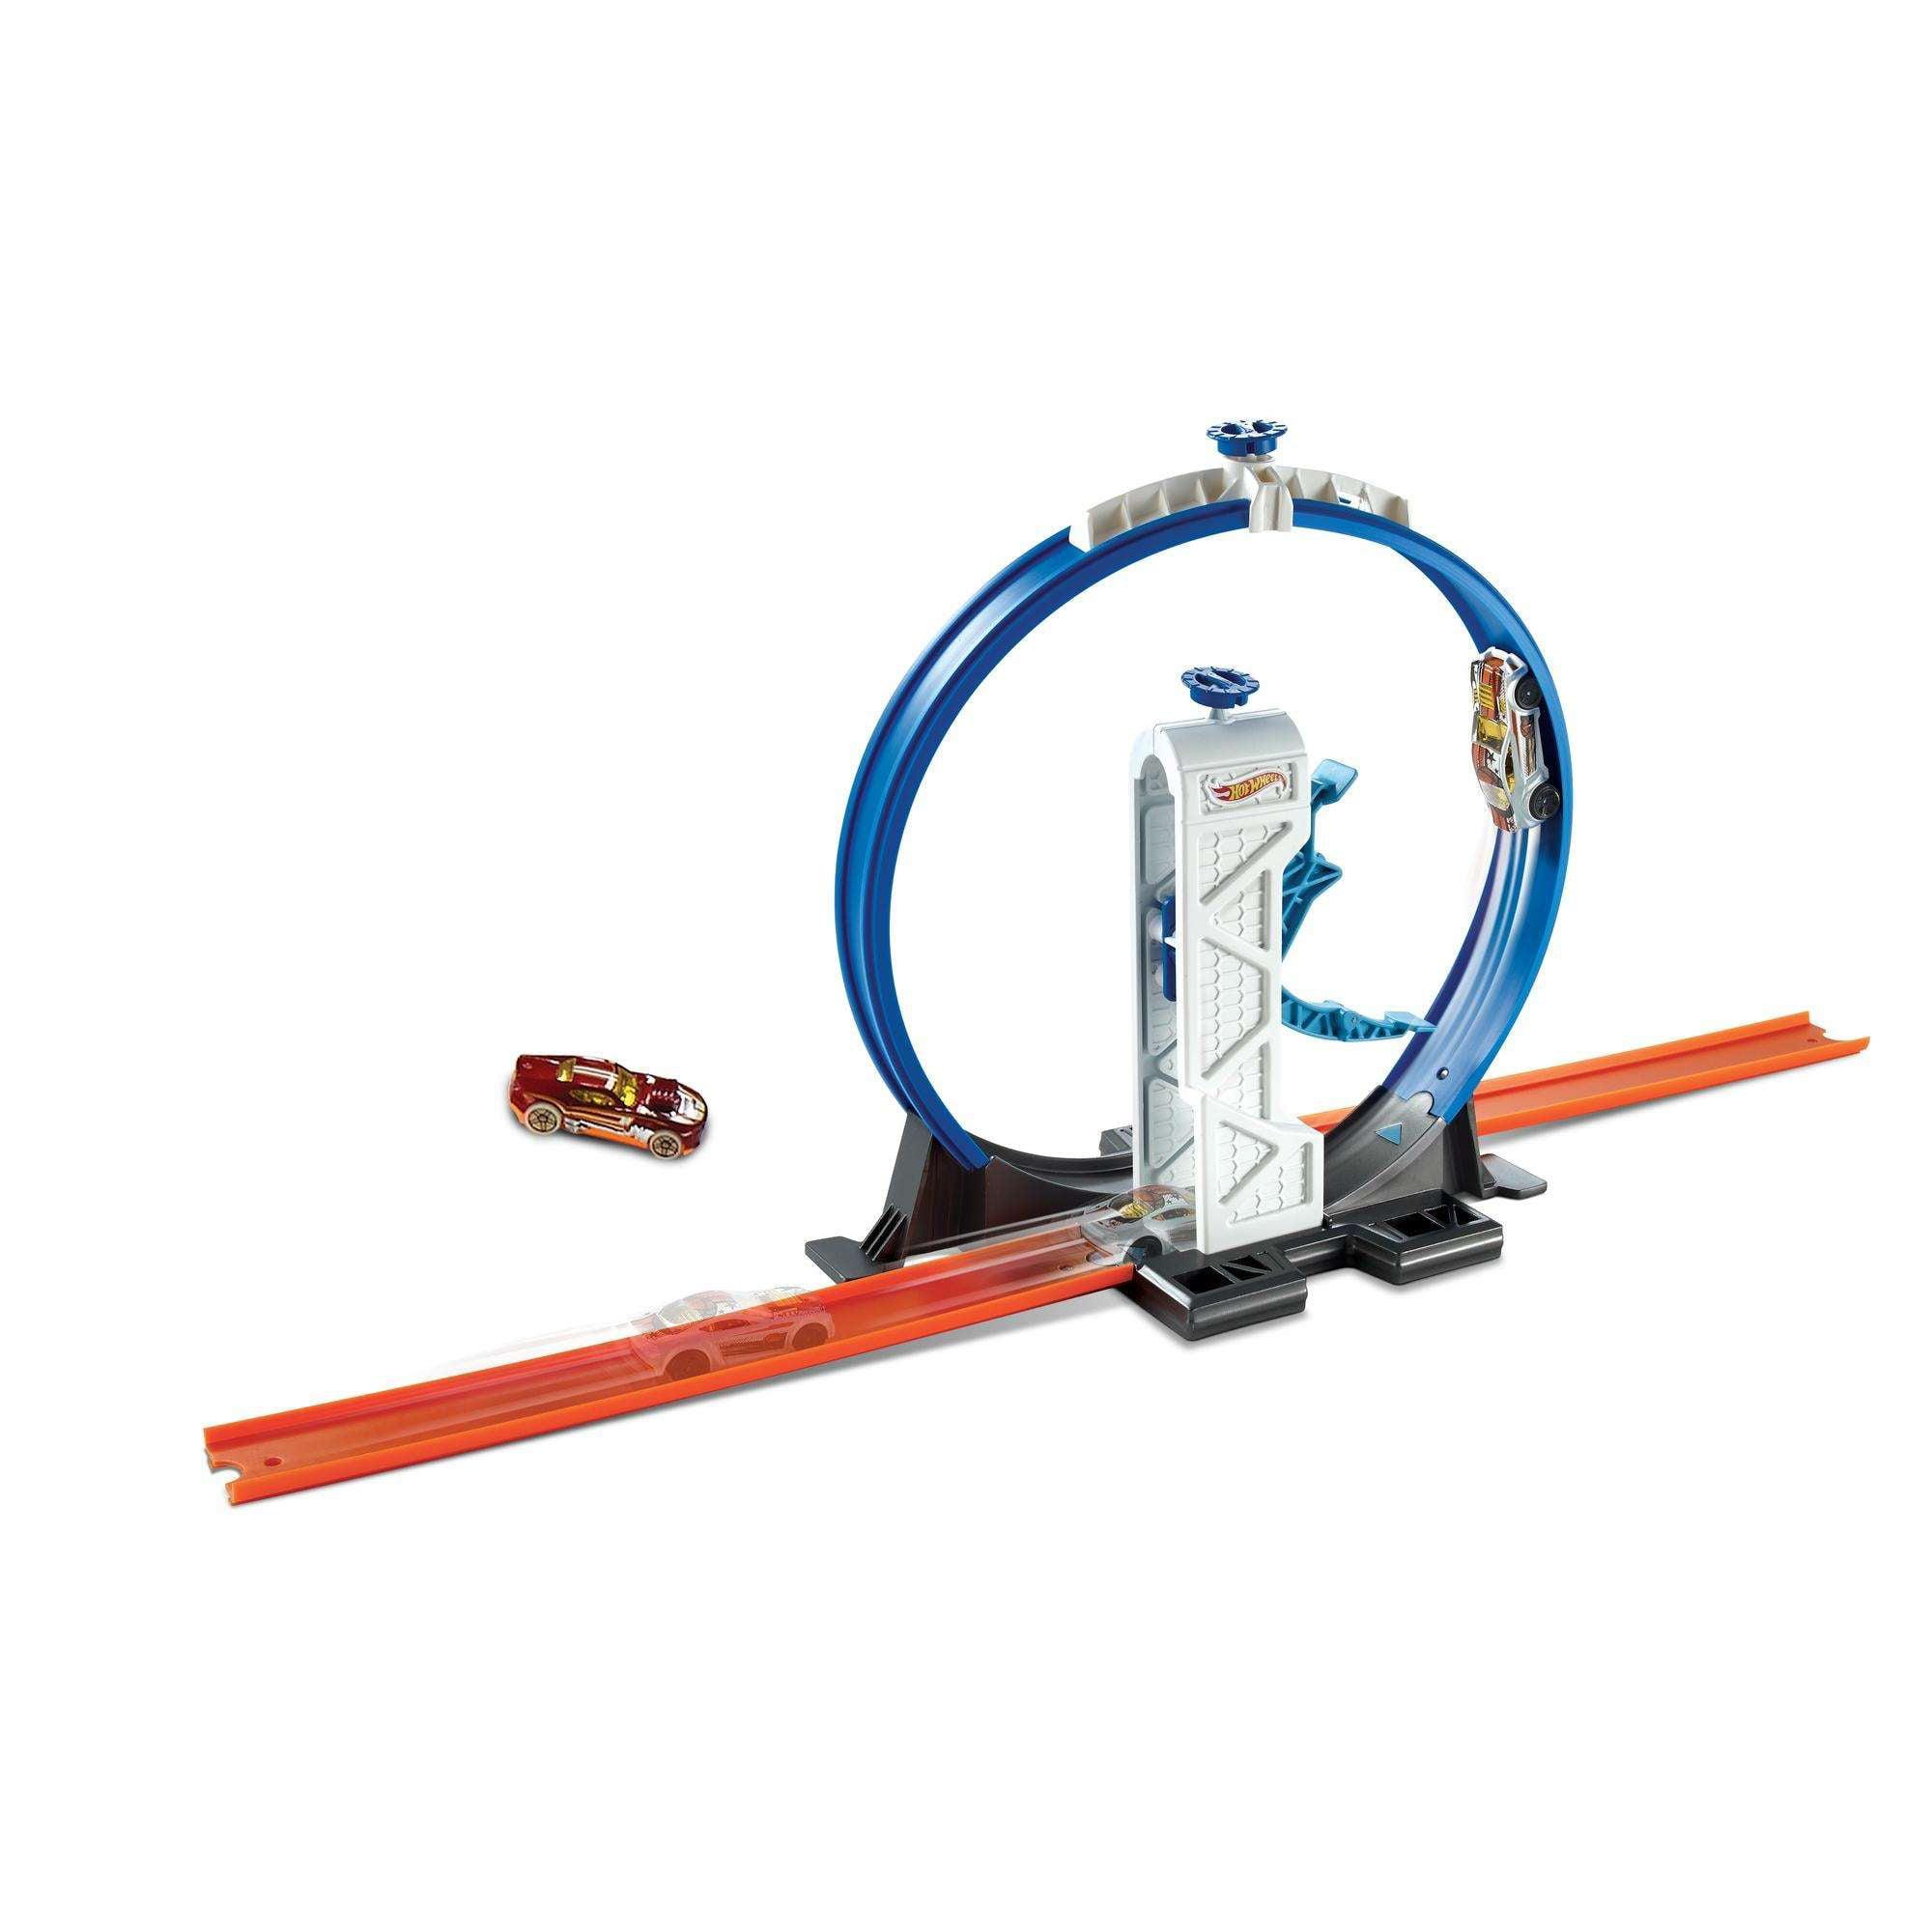 Hot Wheels Track Builder Loop Launcher Trackset by Mattel